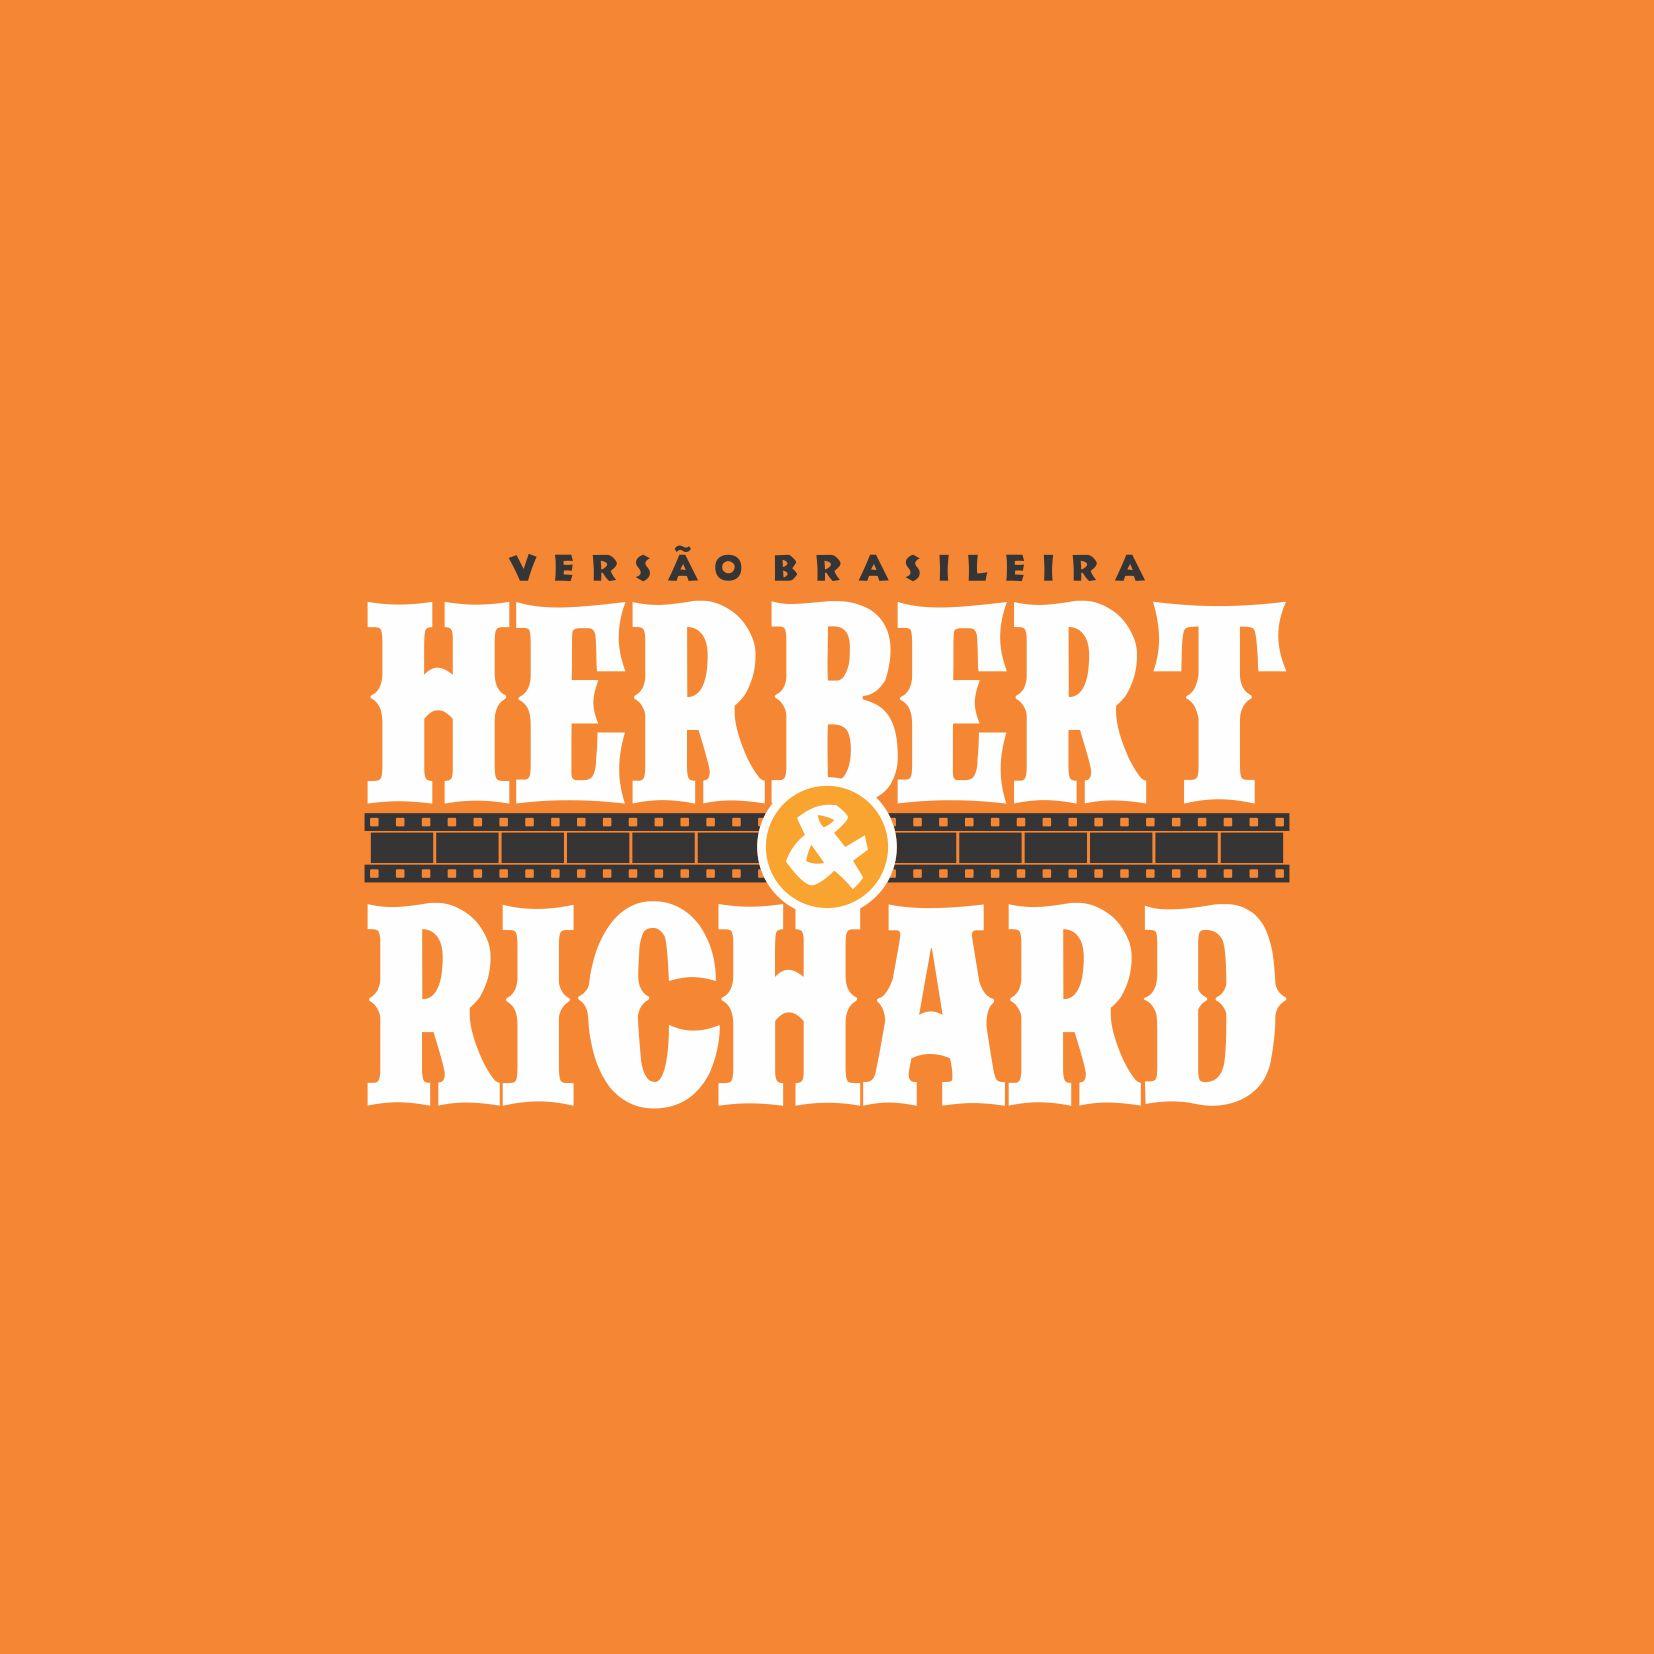 Herbert & Richard